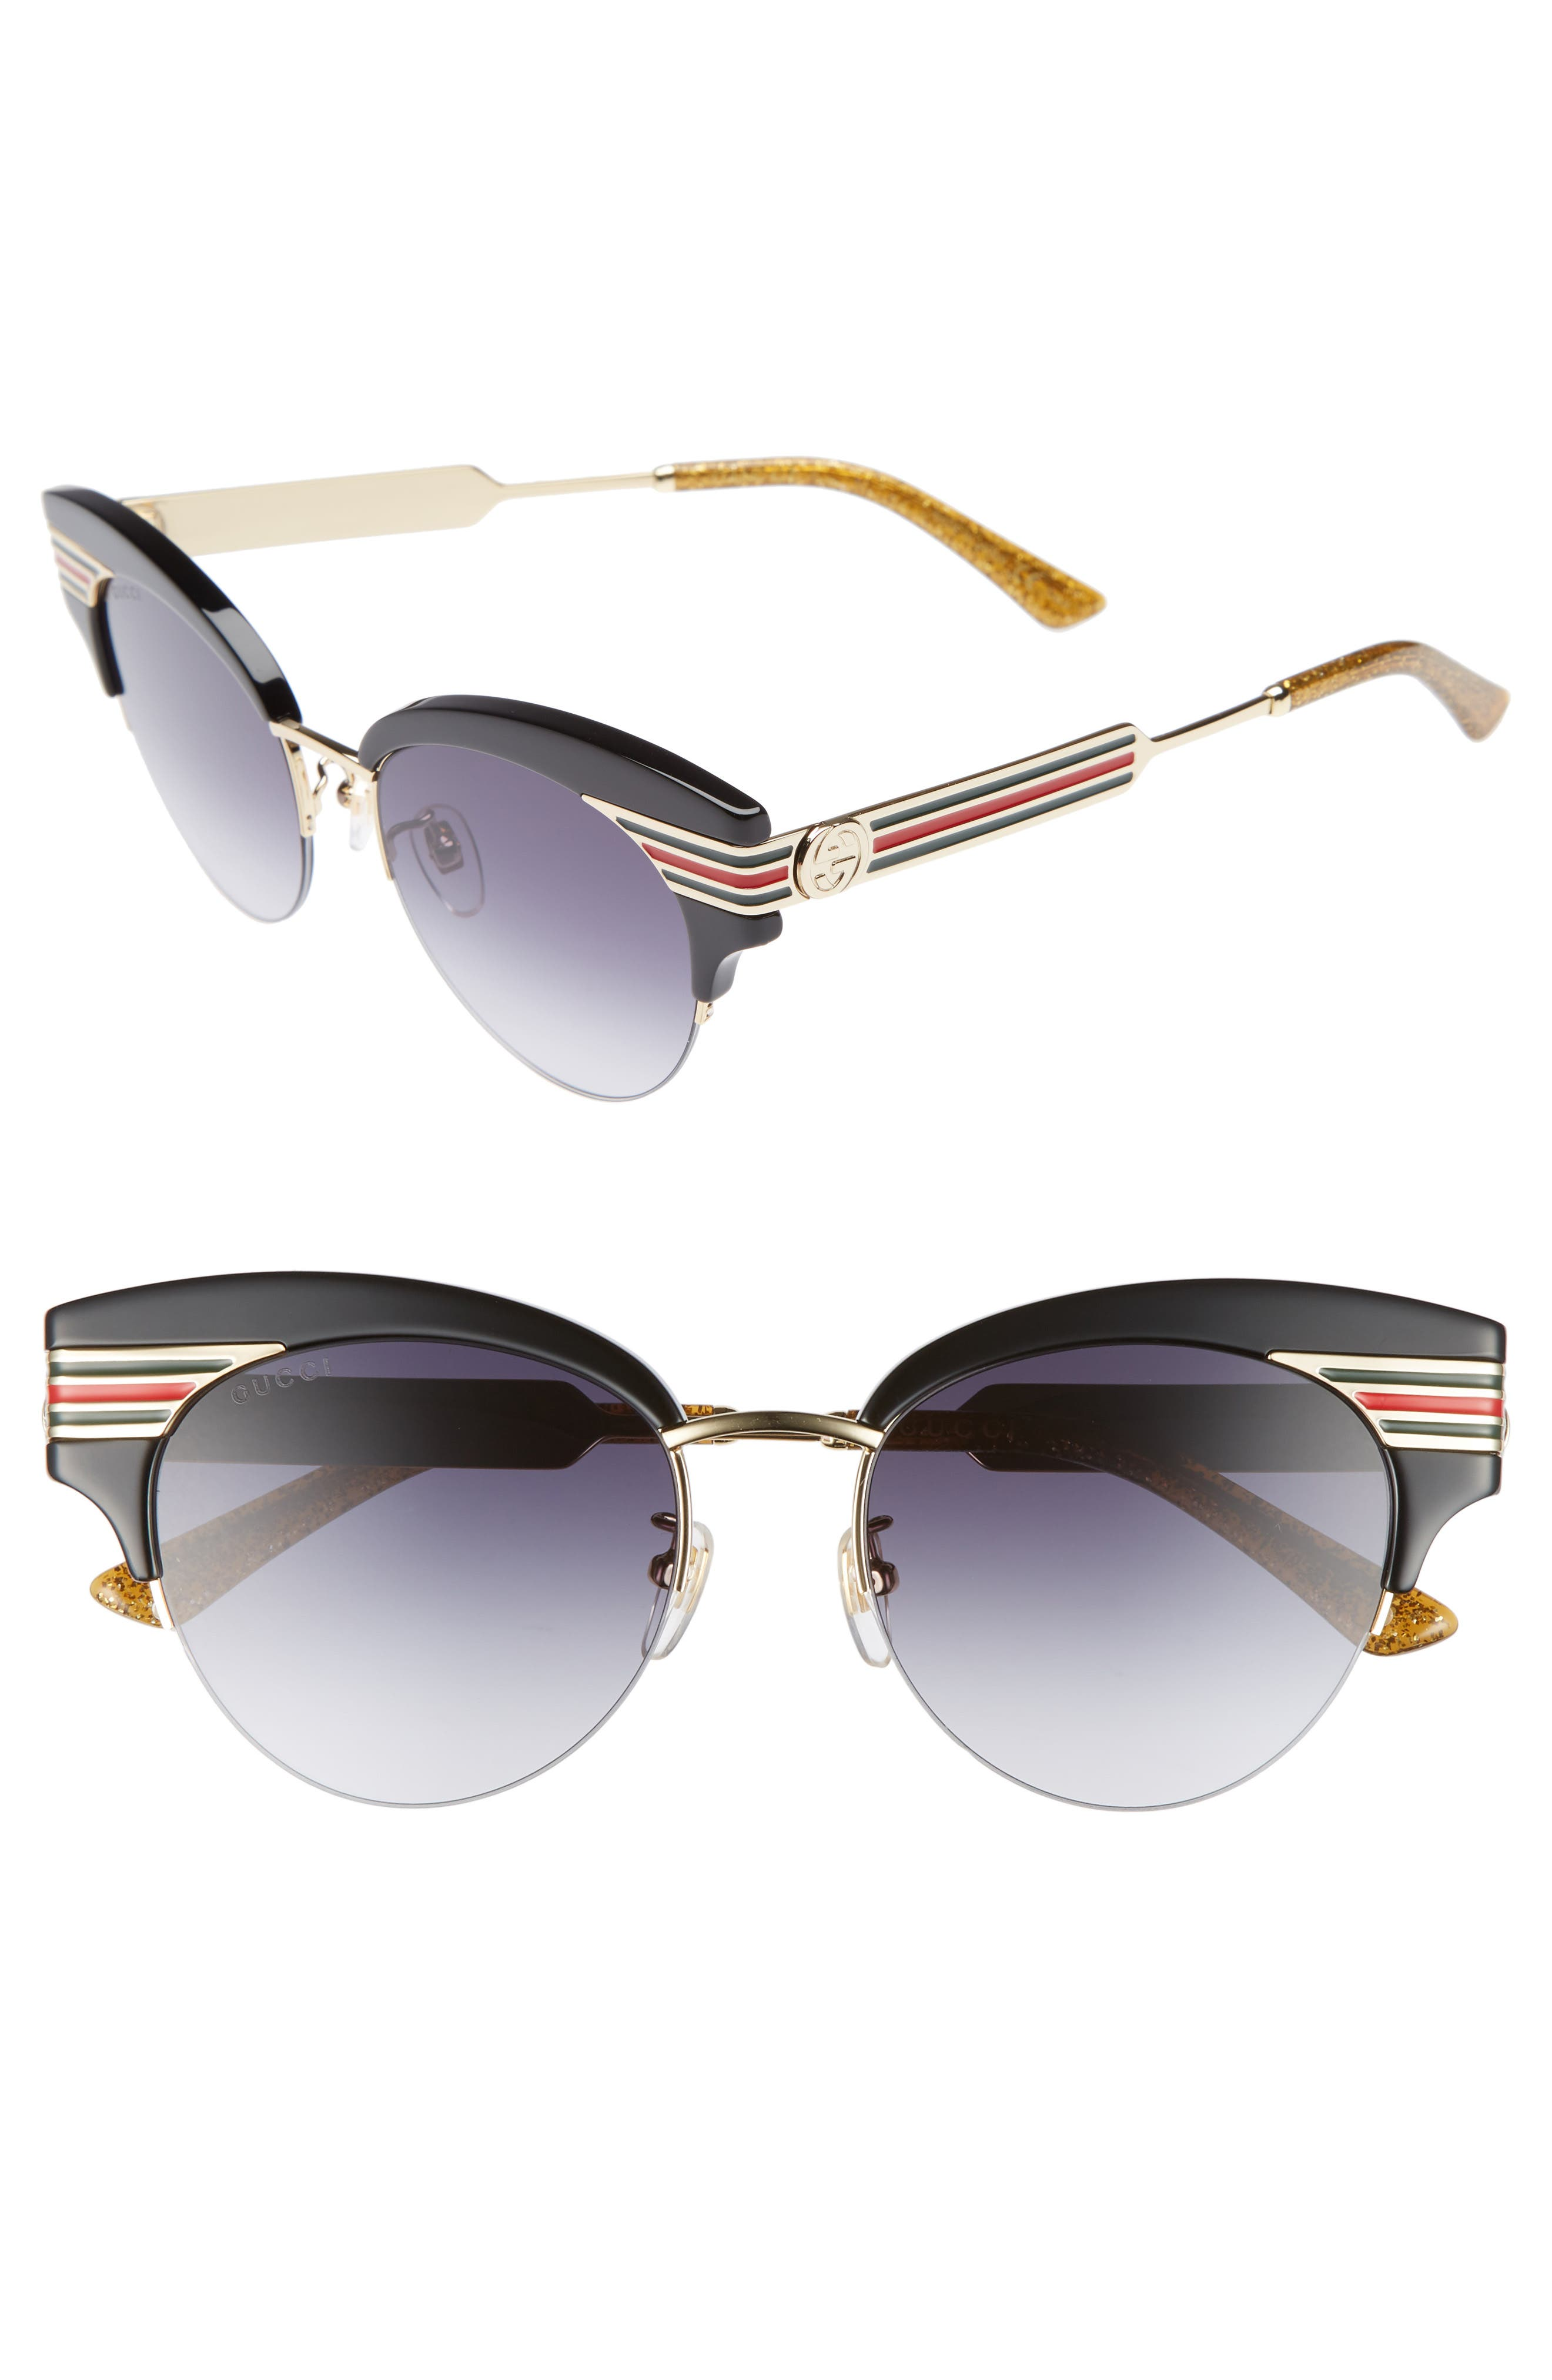 GUCCI, 53mm Cat Eye Sunglasses, Main thumbnail 1, color, GOLD